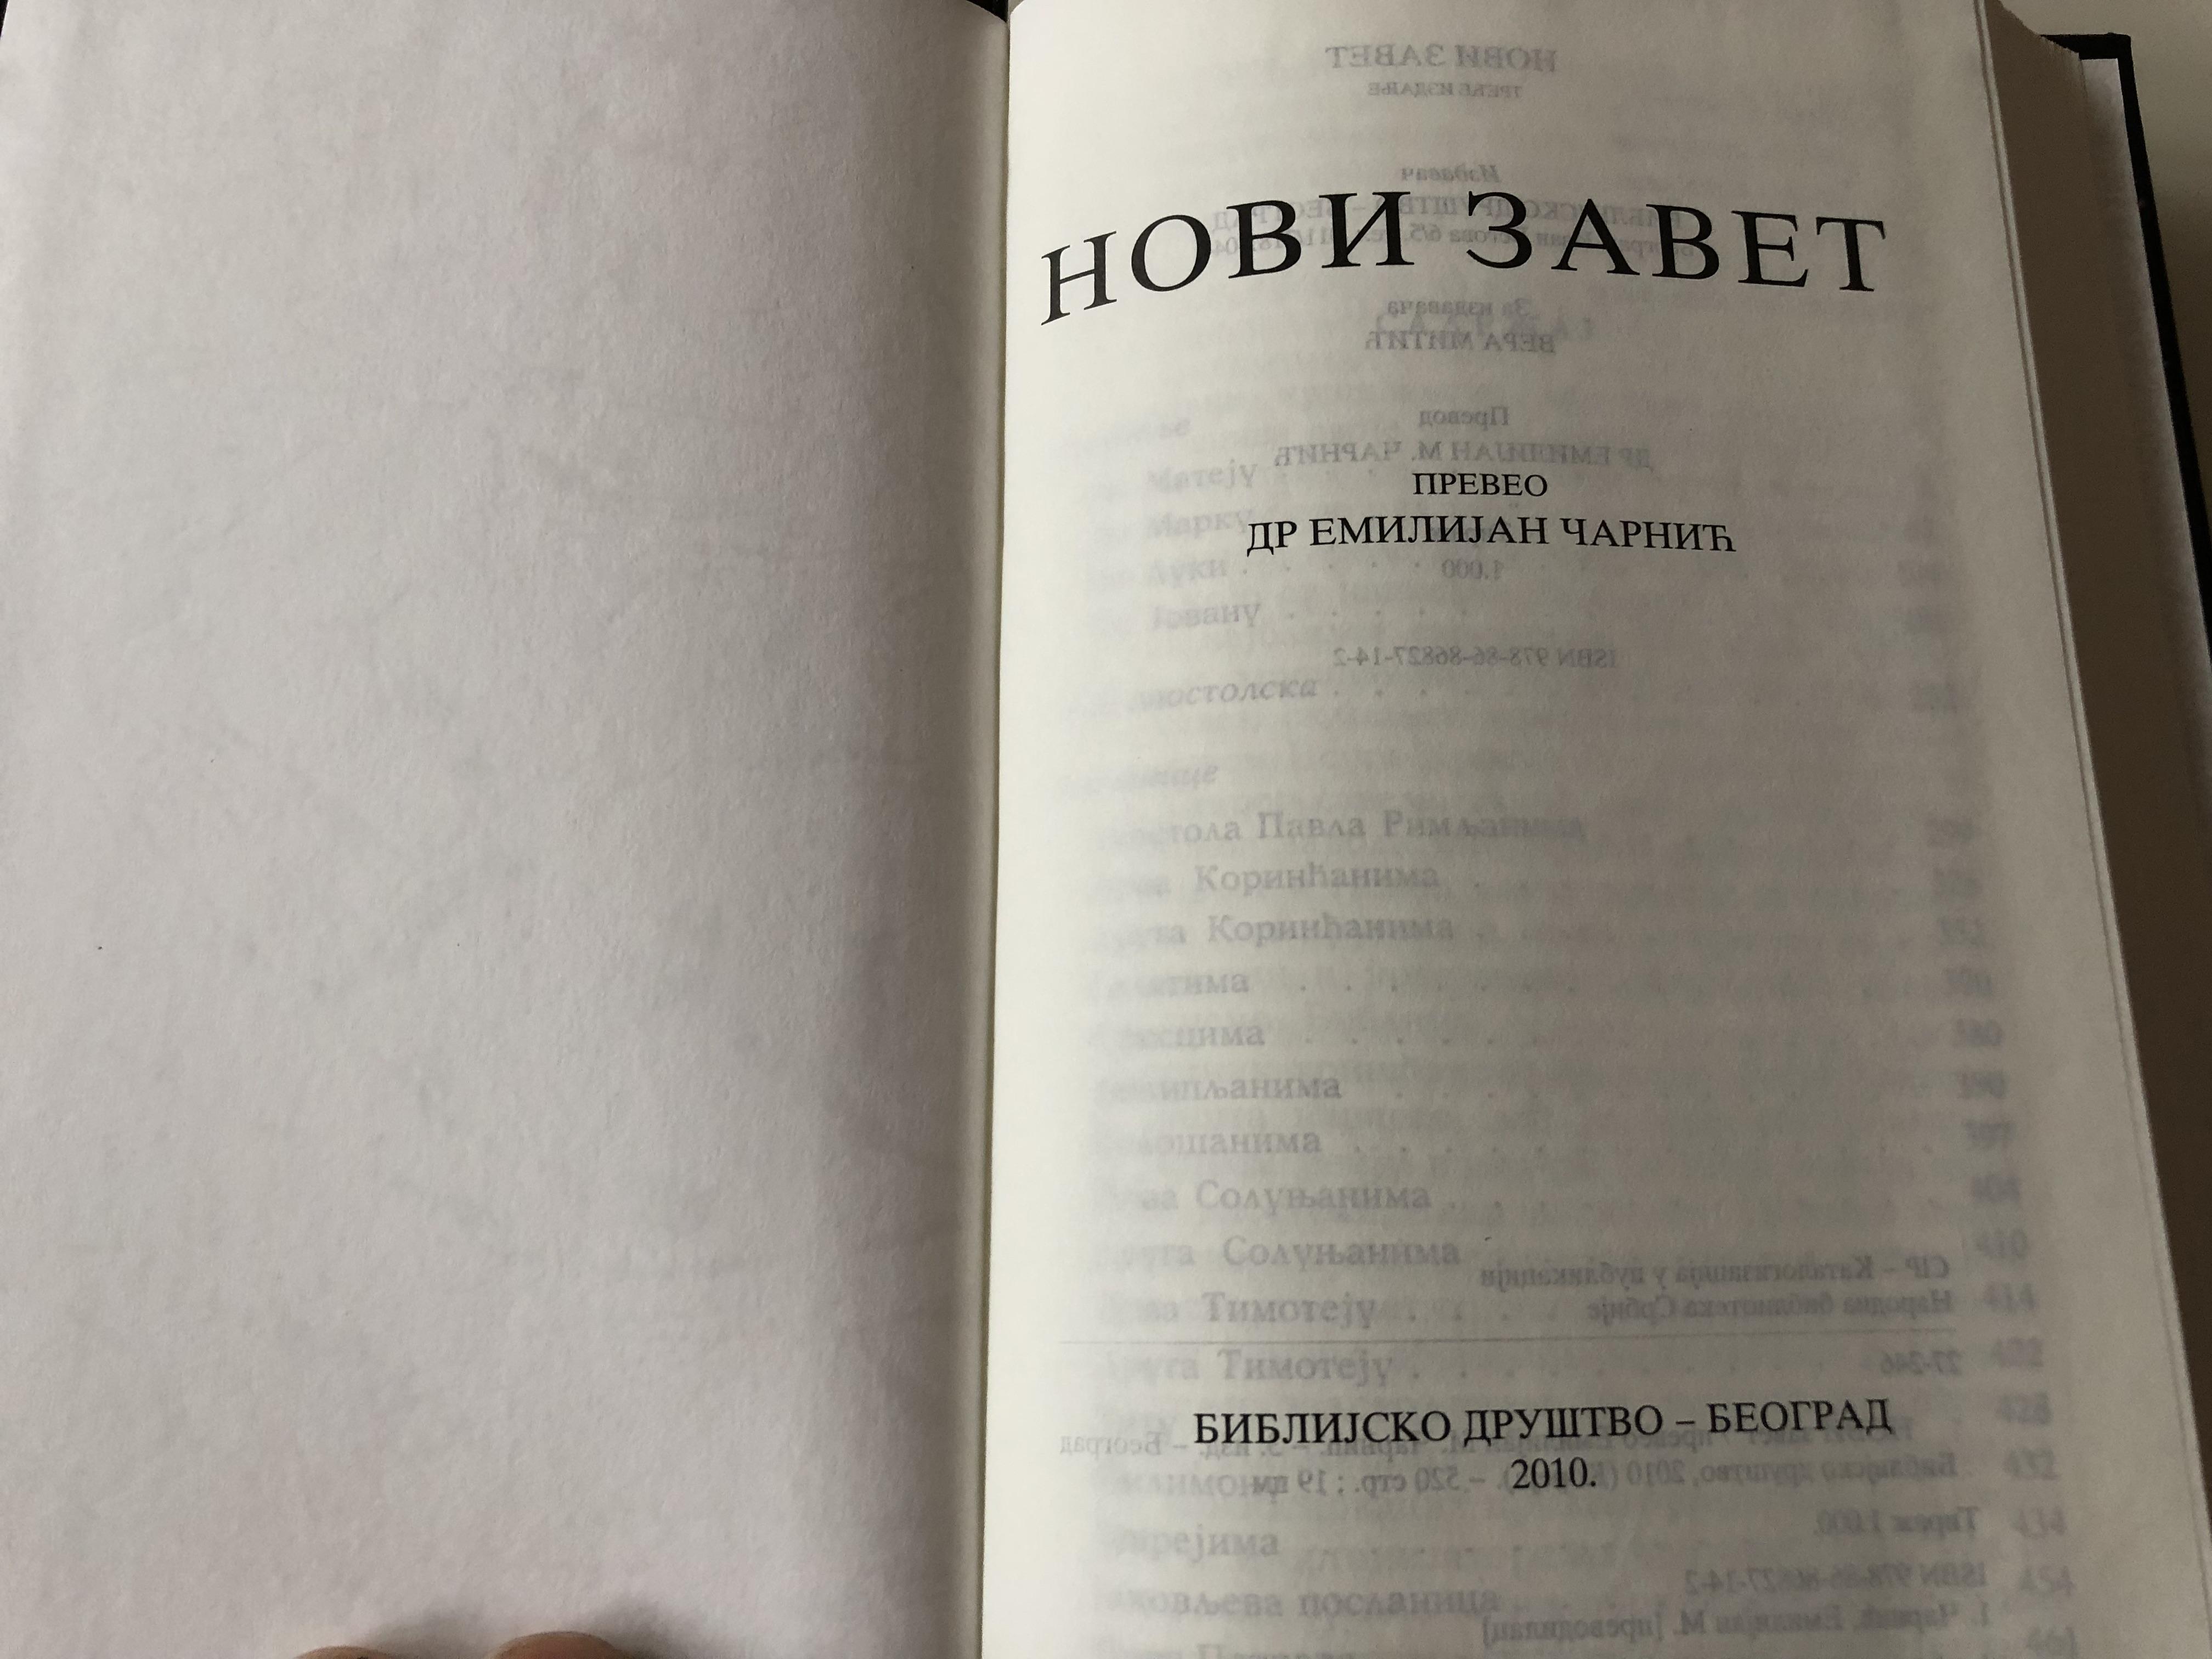 serbian-nt-e-carnic-black-medium-2-.jpg